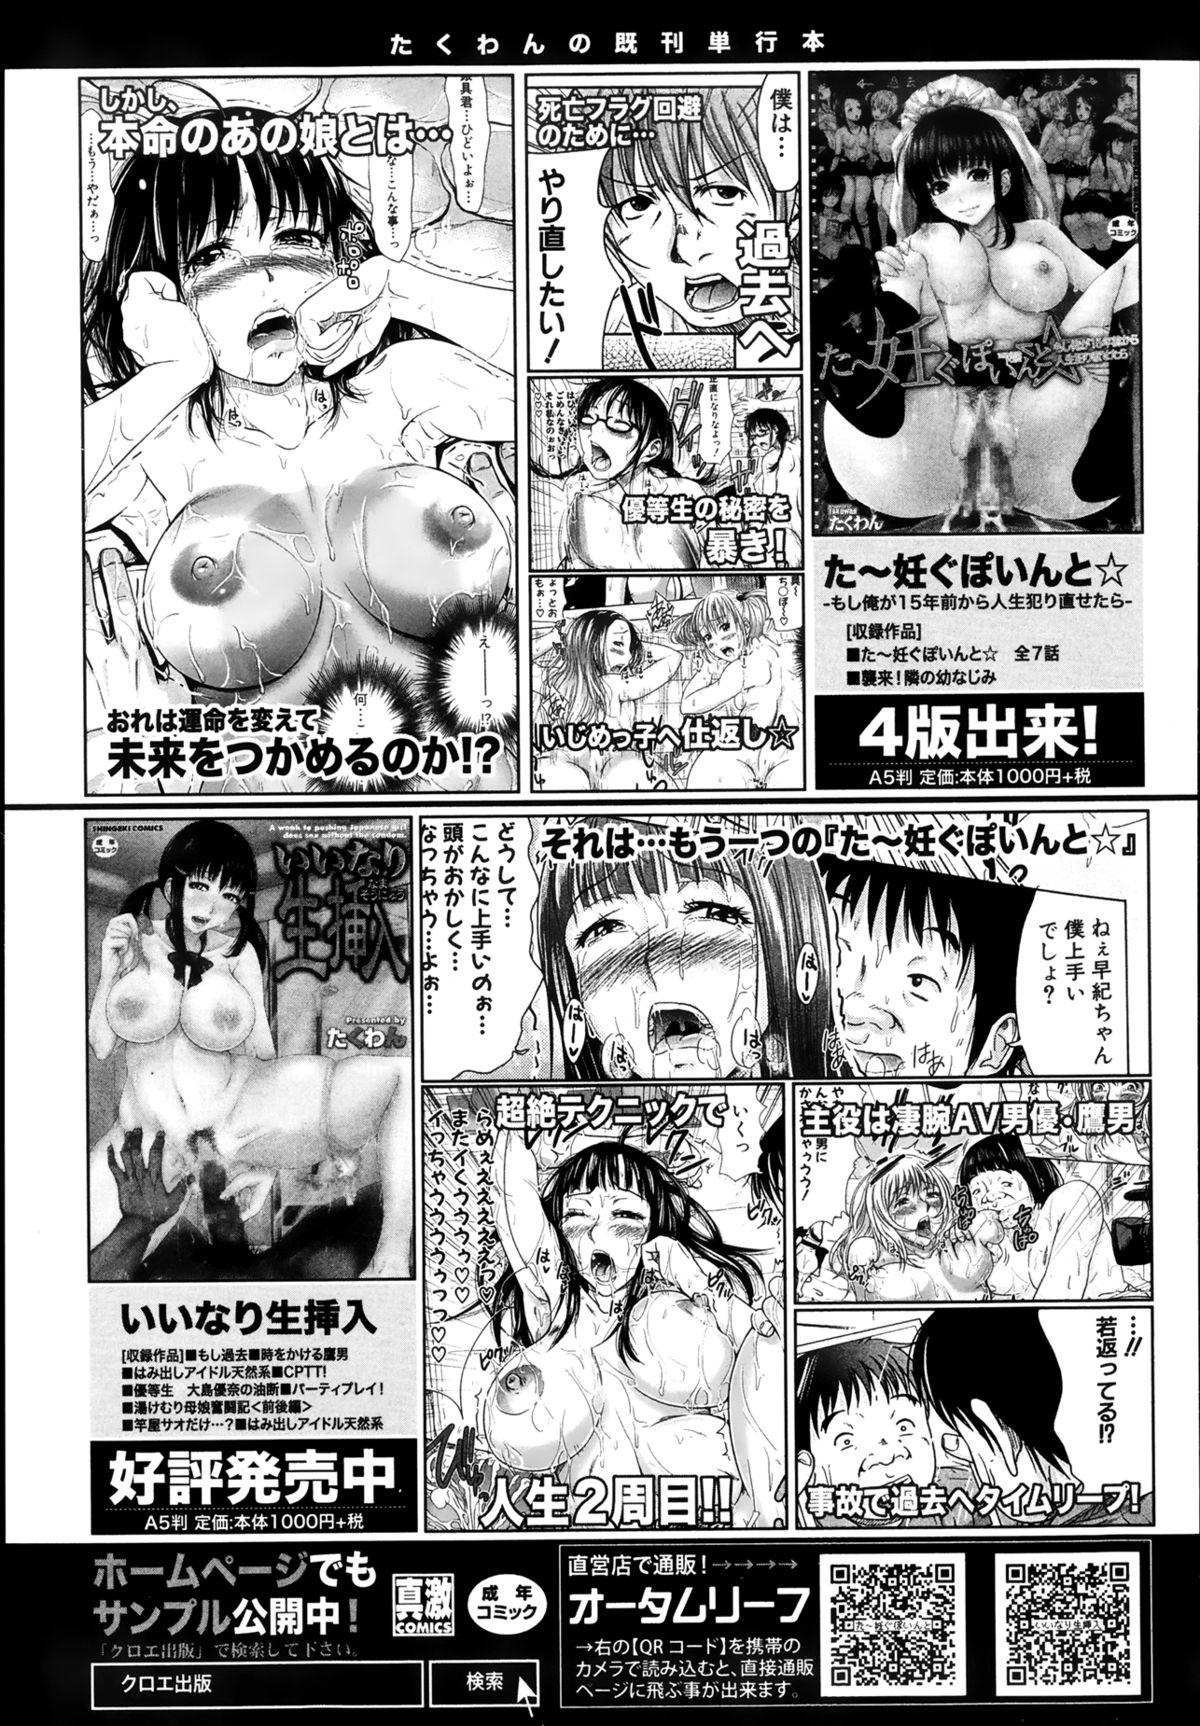 COMIC Shingeki 2013-08 94